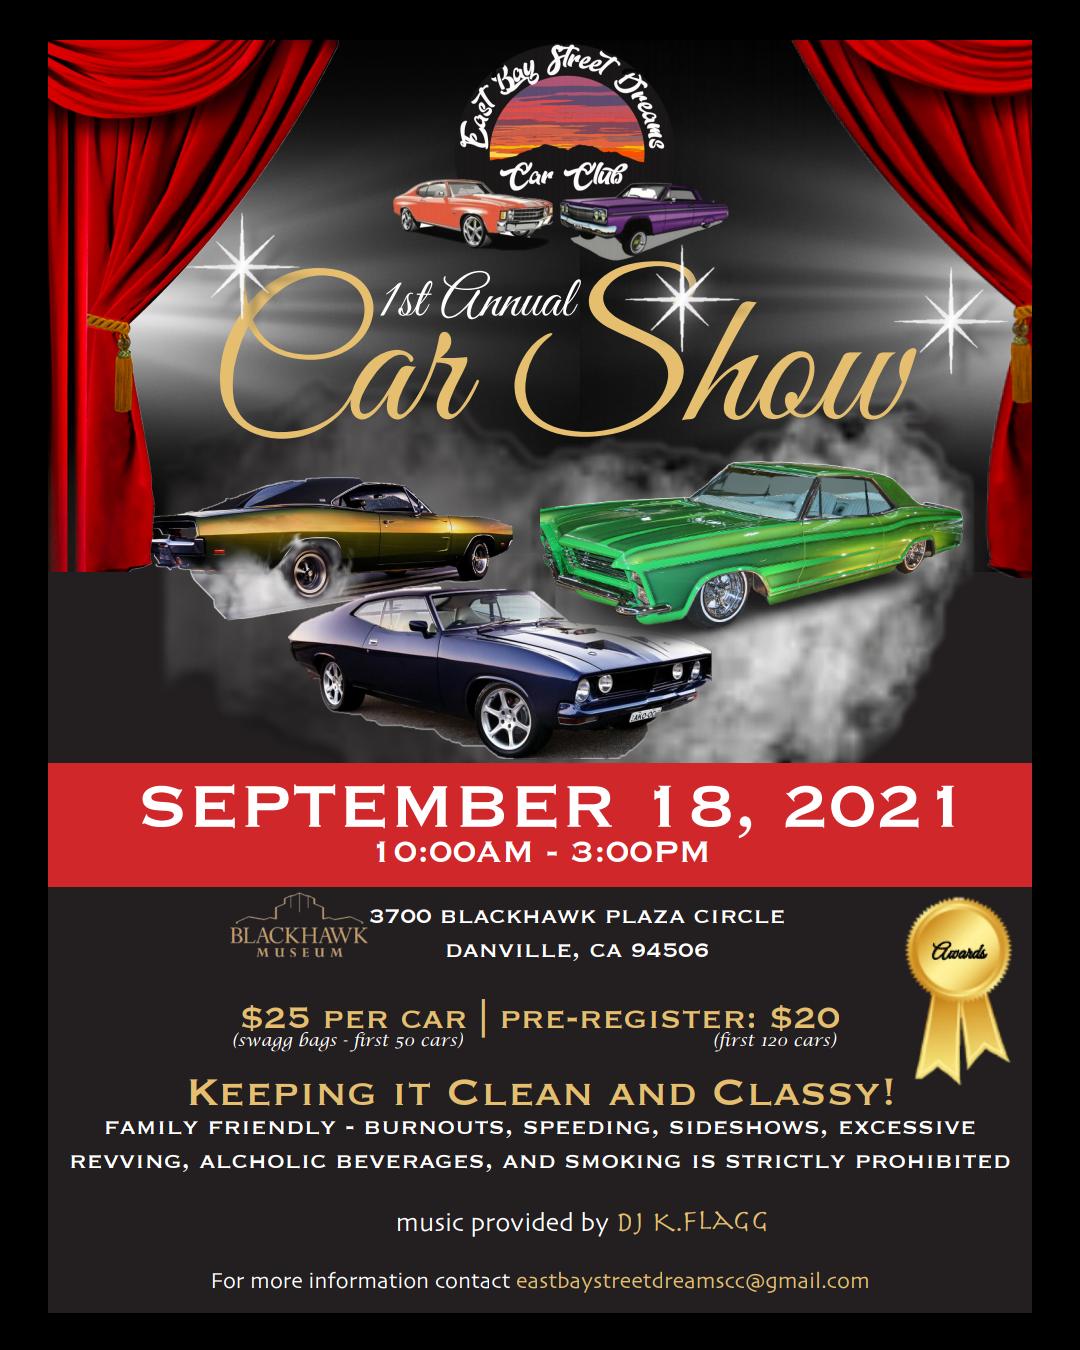 East Bay Street Dreams Car Show